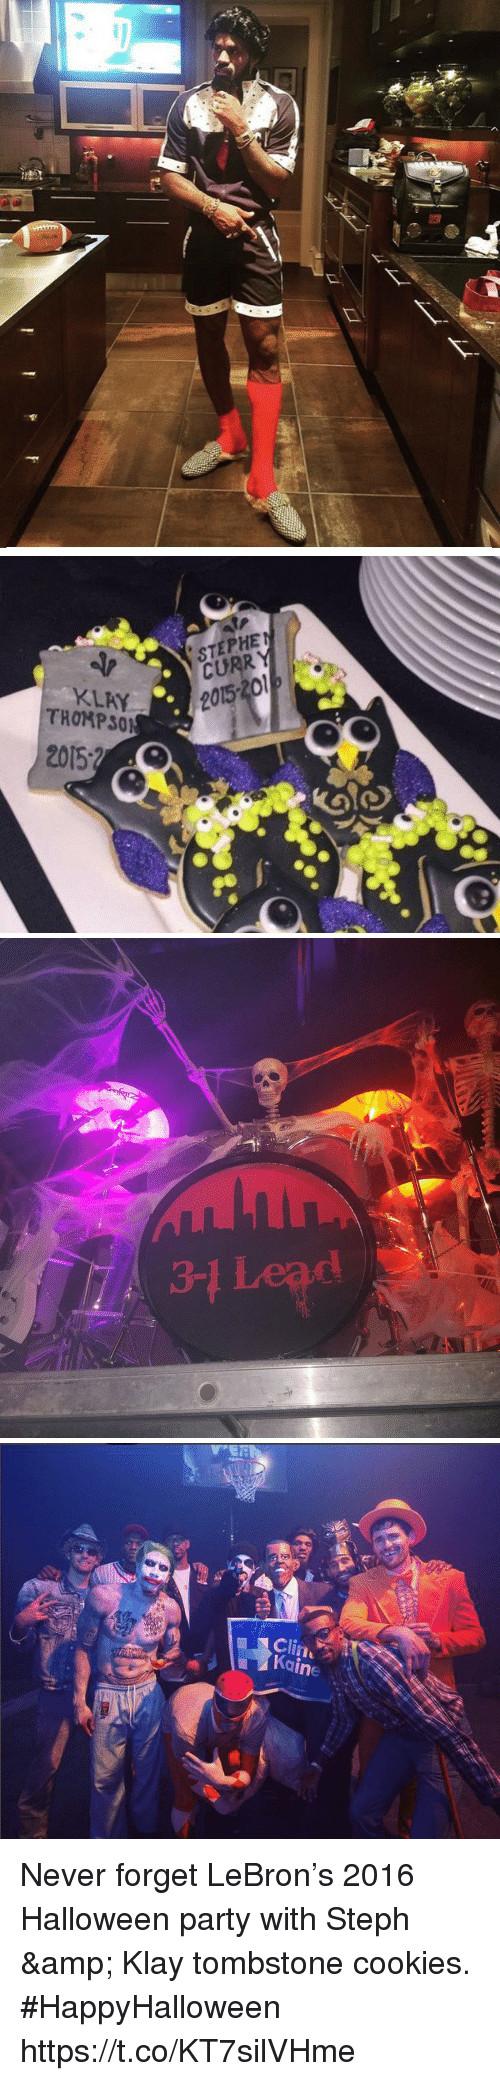 Lebron Halloween Cookies  25 Best Memes About Stephe